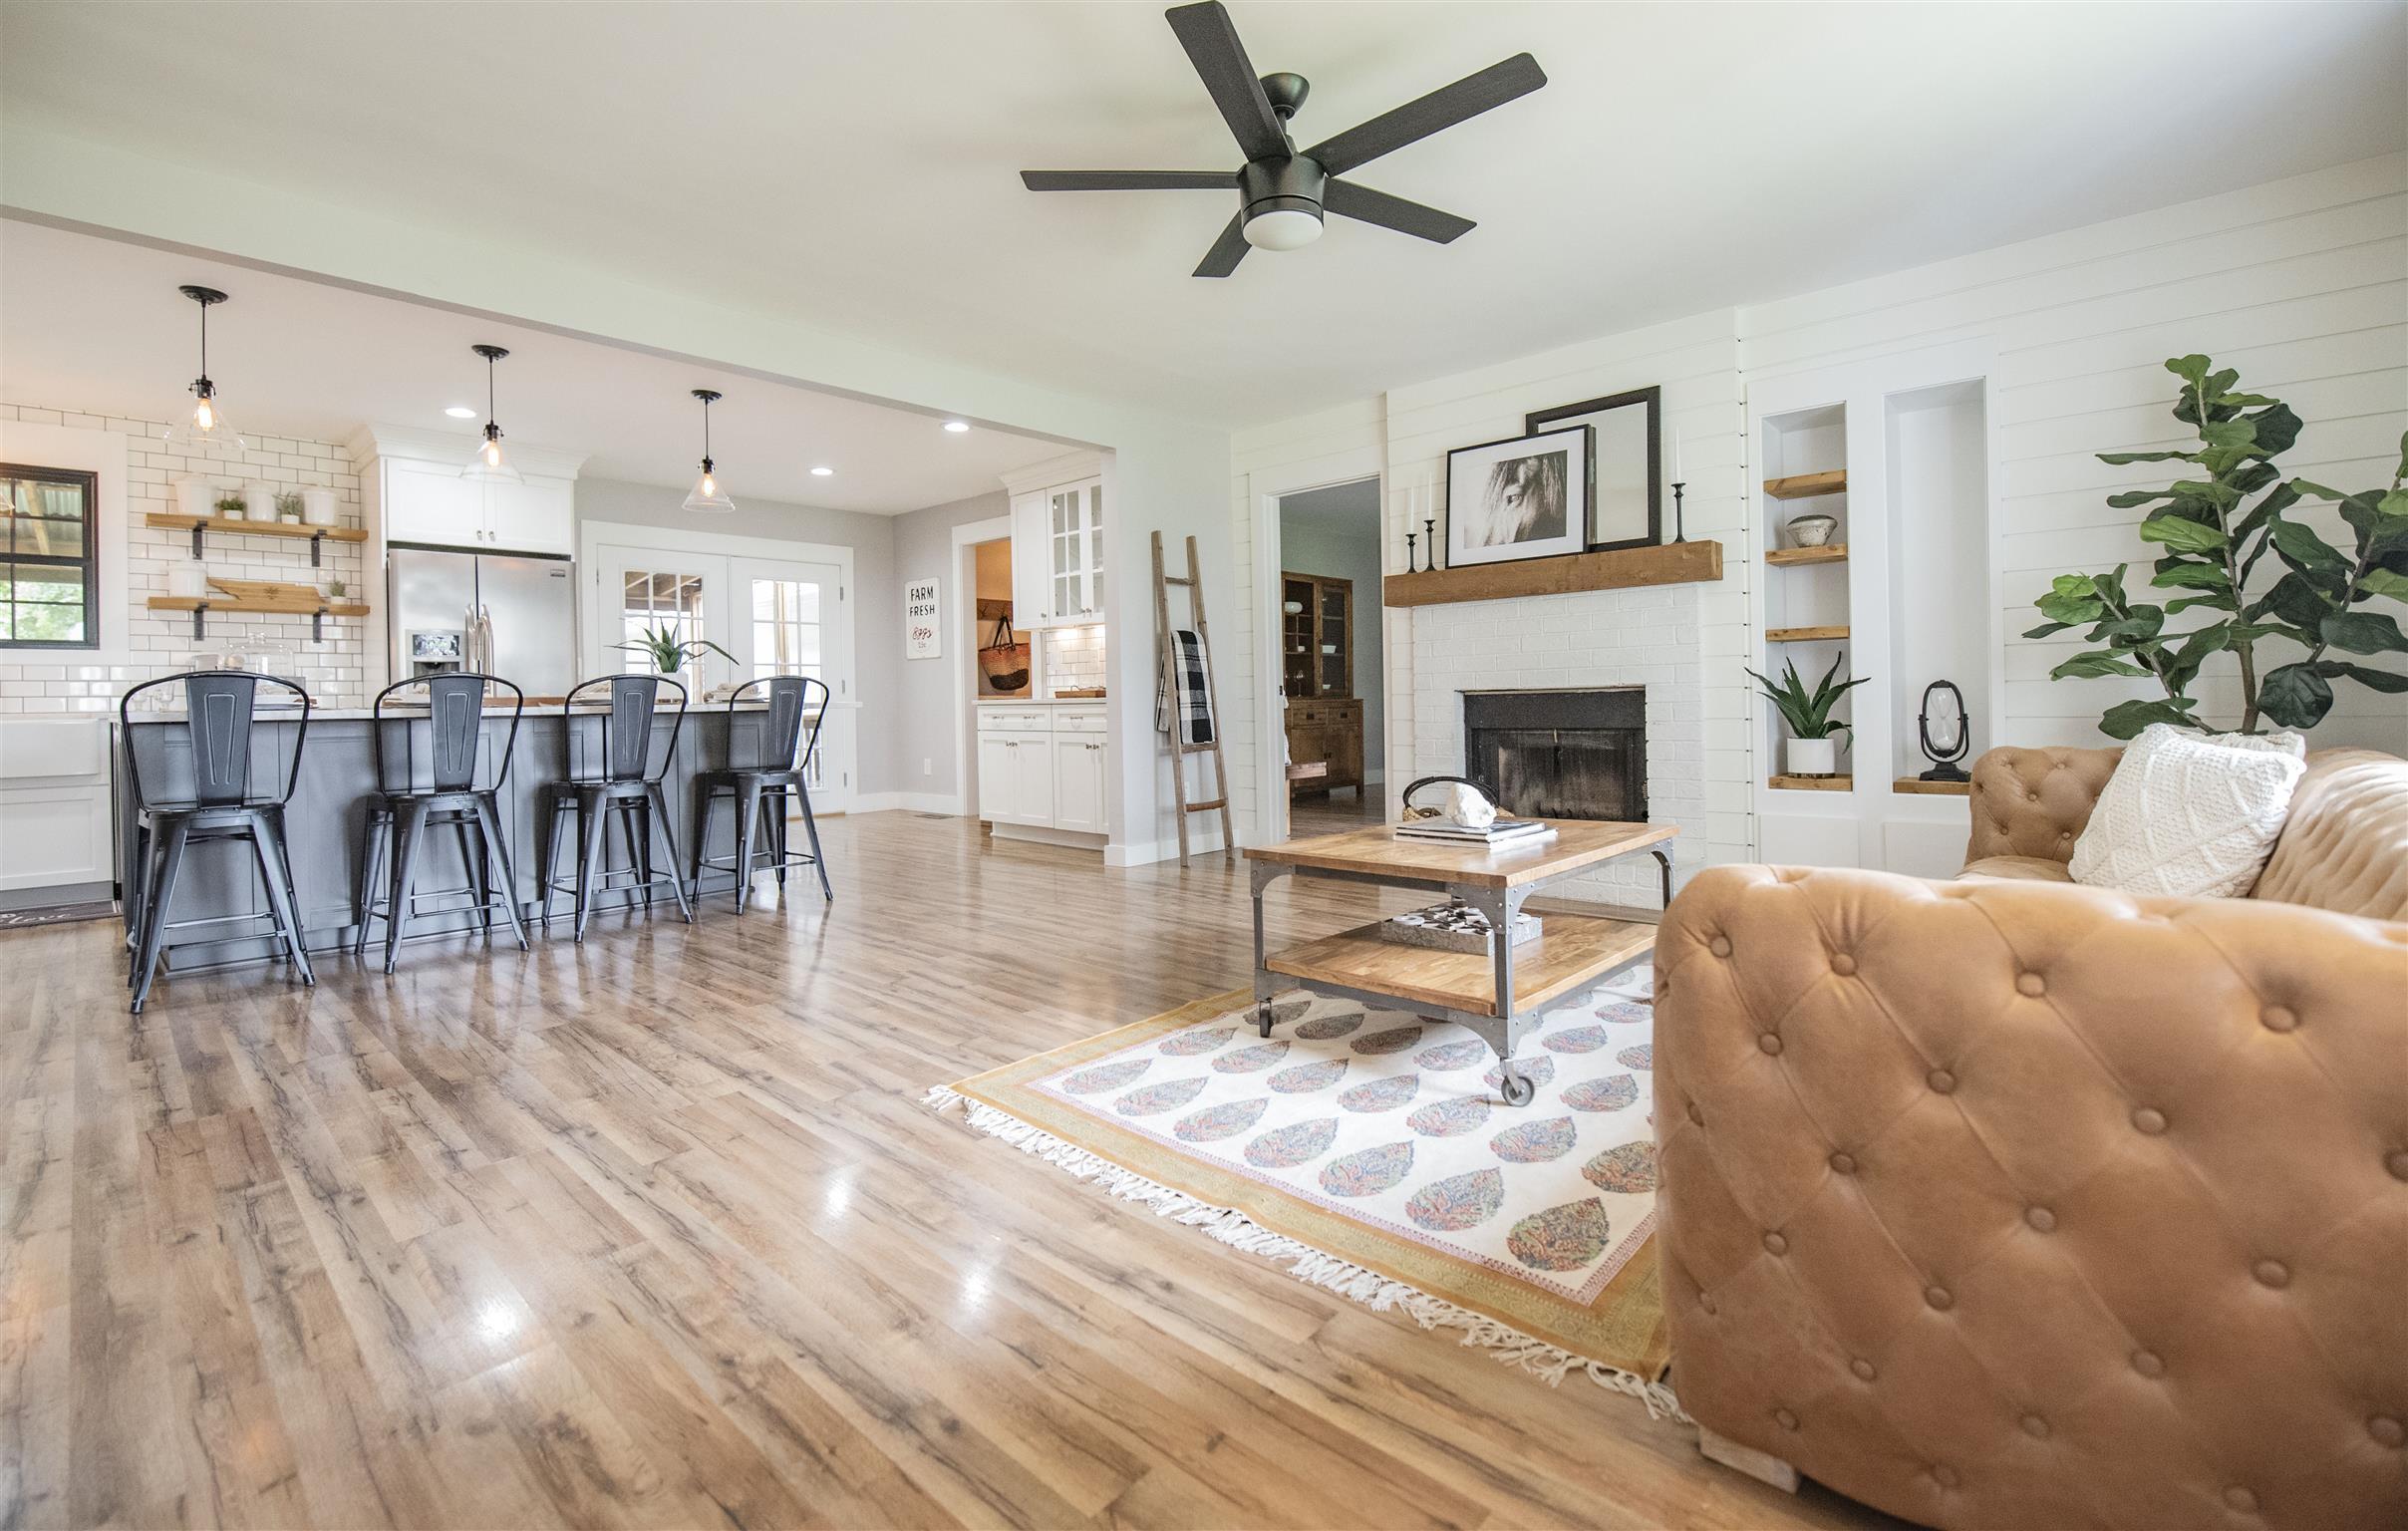 2595 West Park Dr, Murfreesboro, TN 37129 - Murfreesboro, TN real estate listing